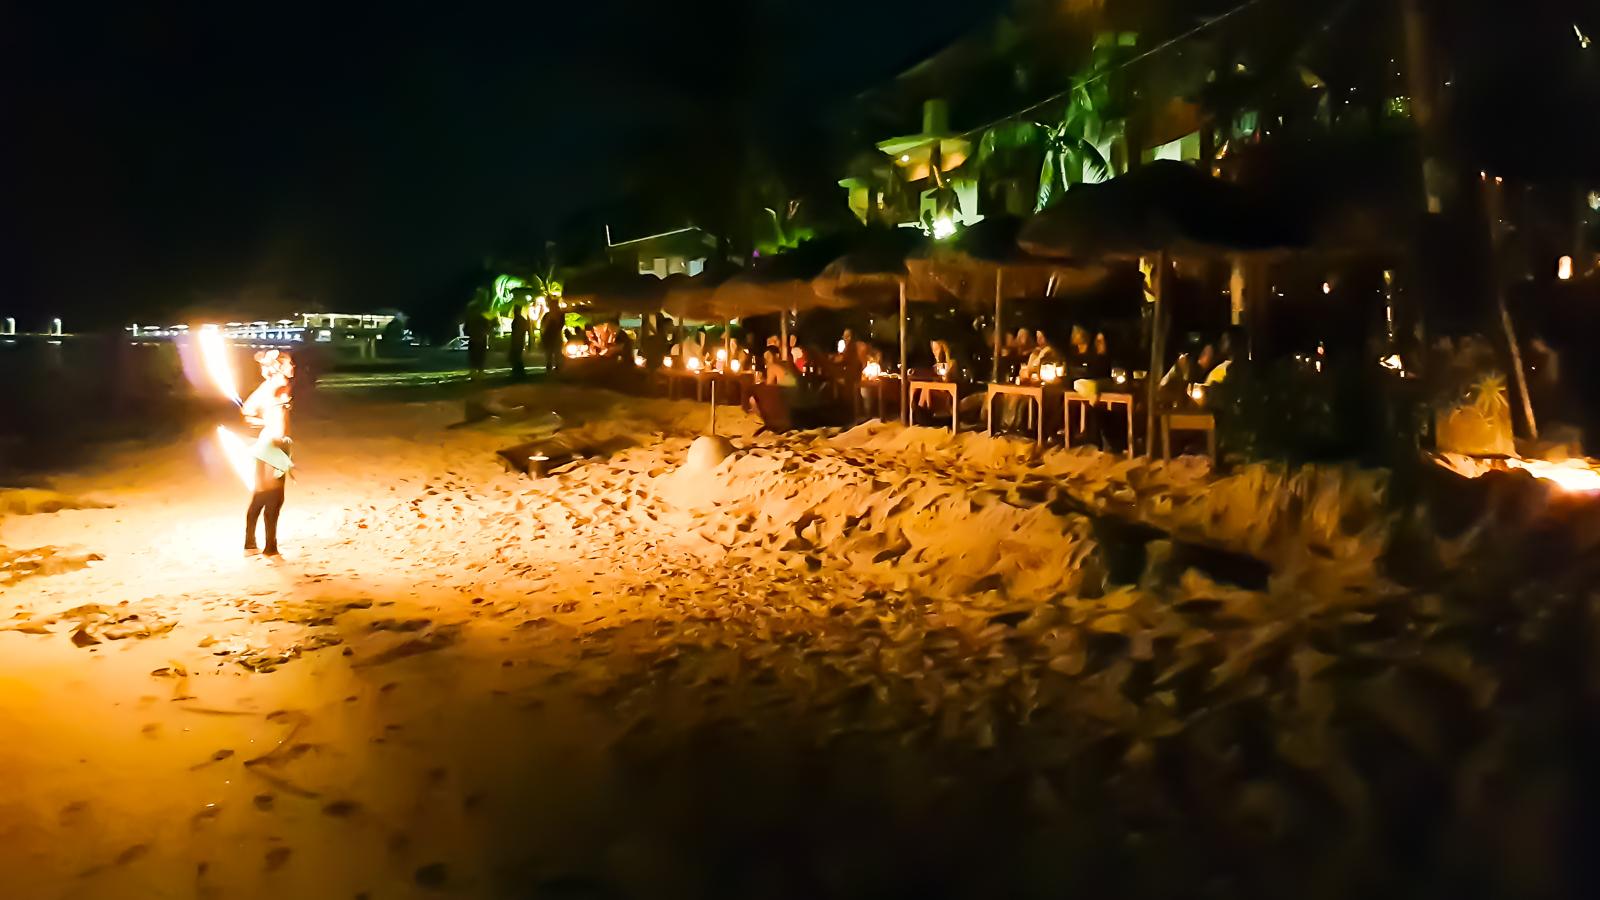 Mexique - Playa Del Carmen - Soirée plage - Latinexperience voy